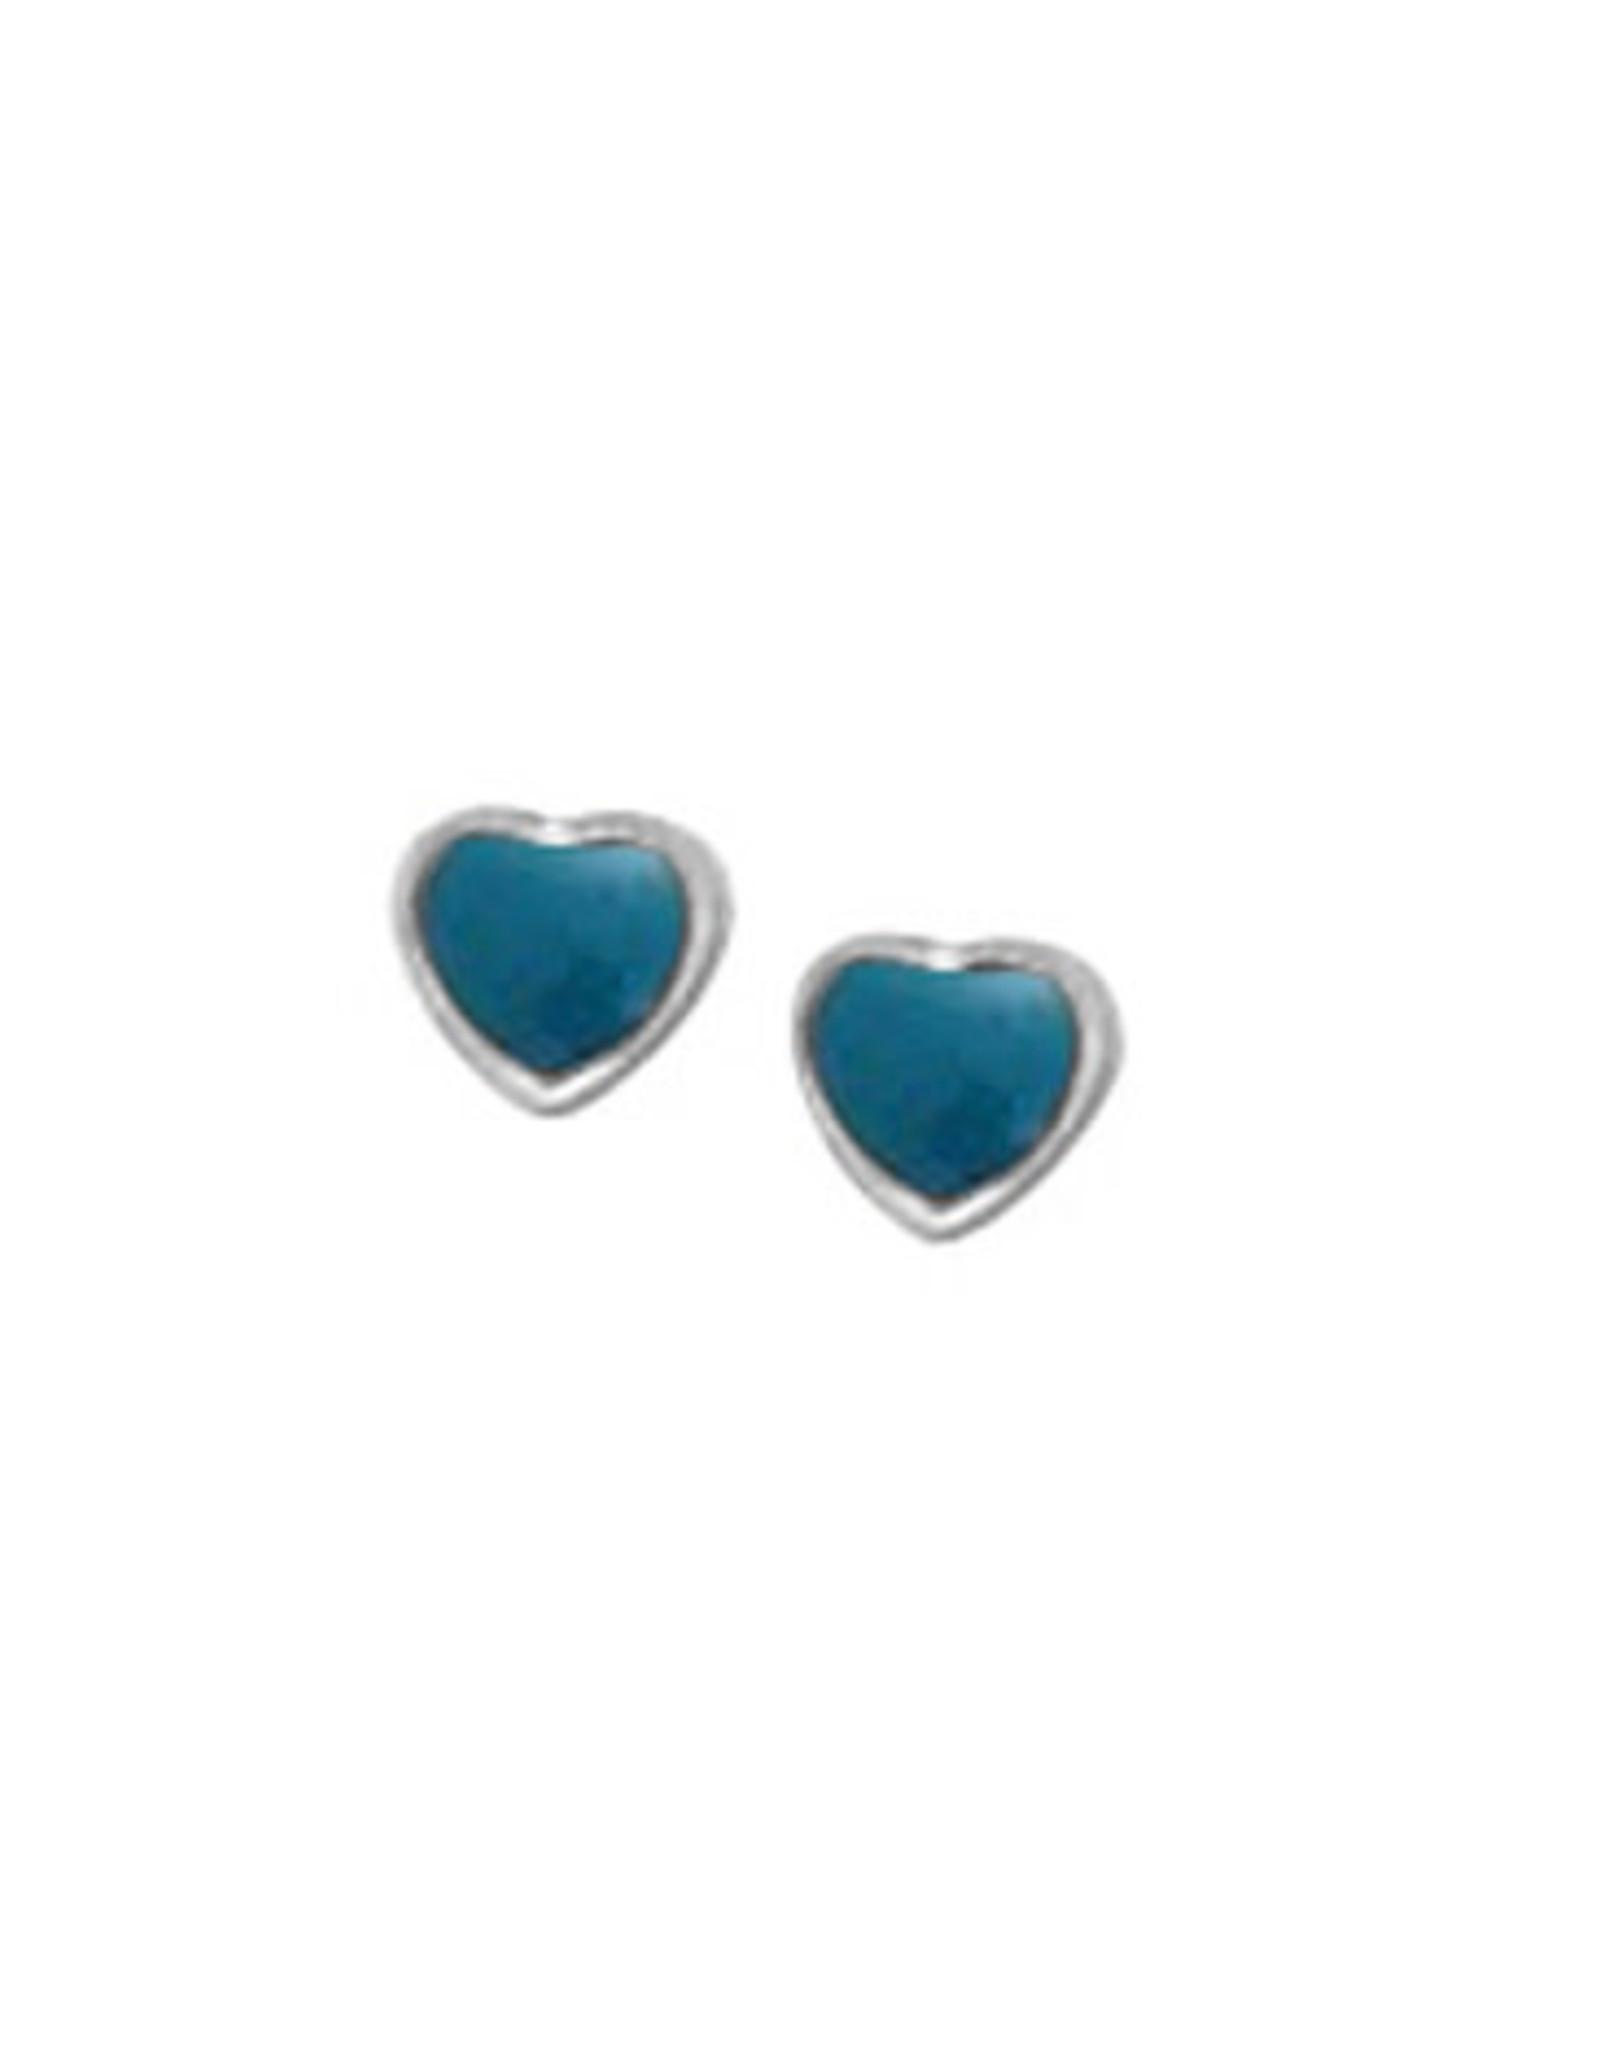 Boma HEART BLUE RESIN STUD EARRING SILVER